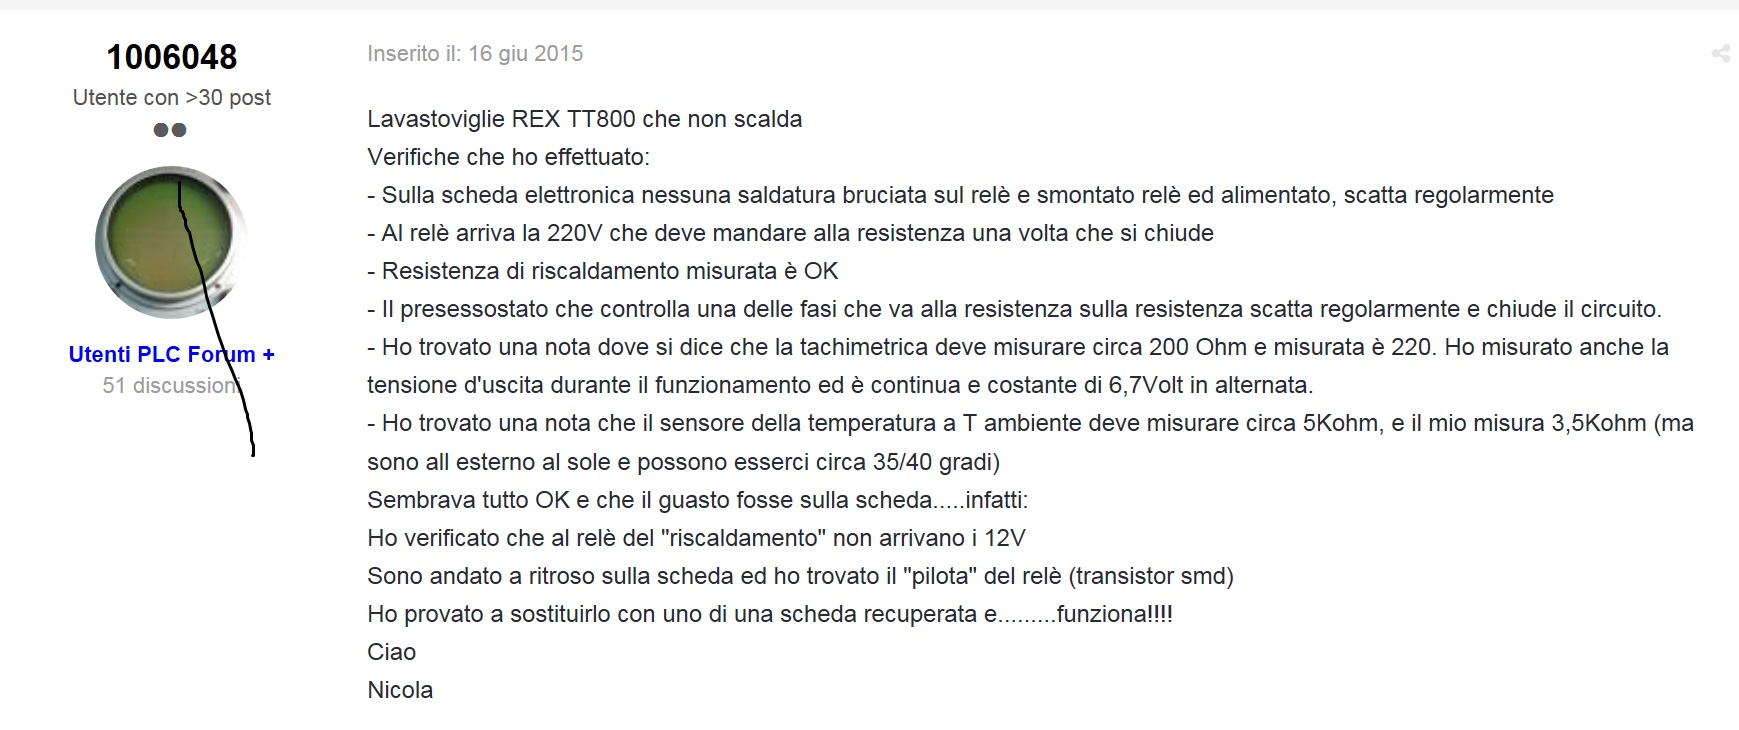 http://www.energialternativa.info/public/newforum/ForumEA/H/lavastoviglie_1.jpg